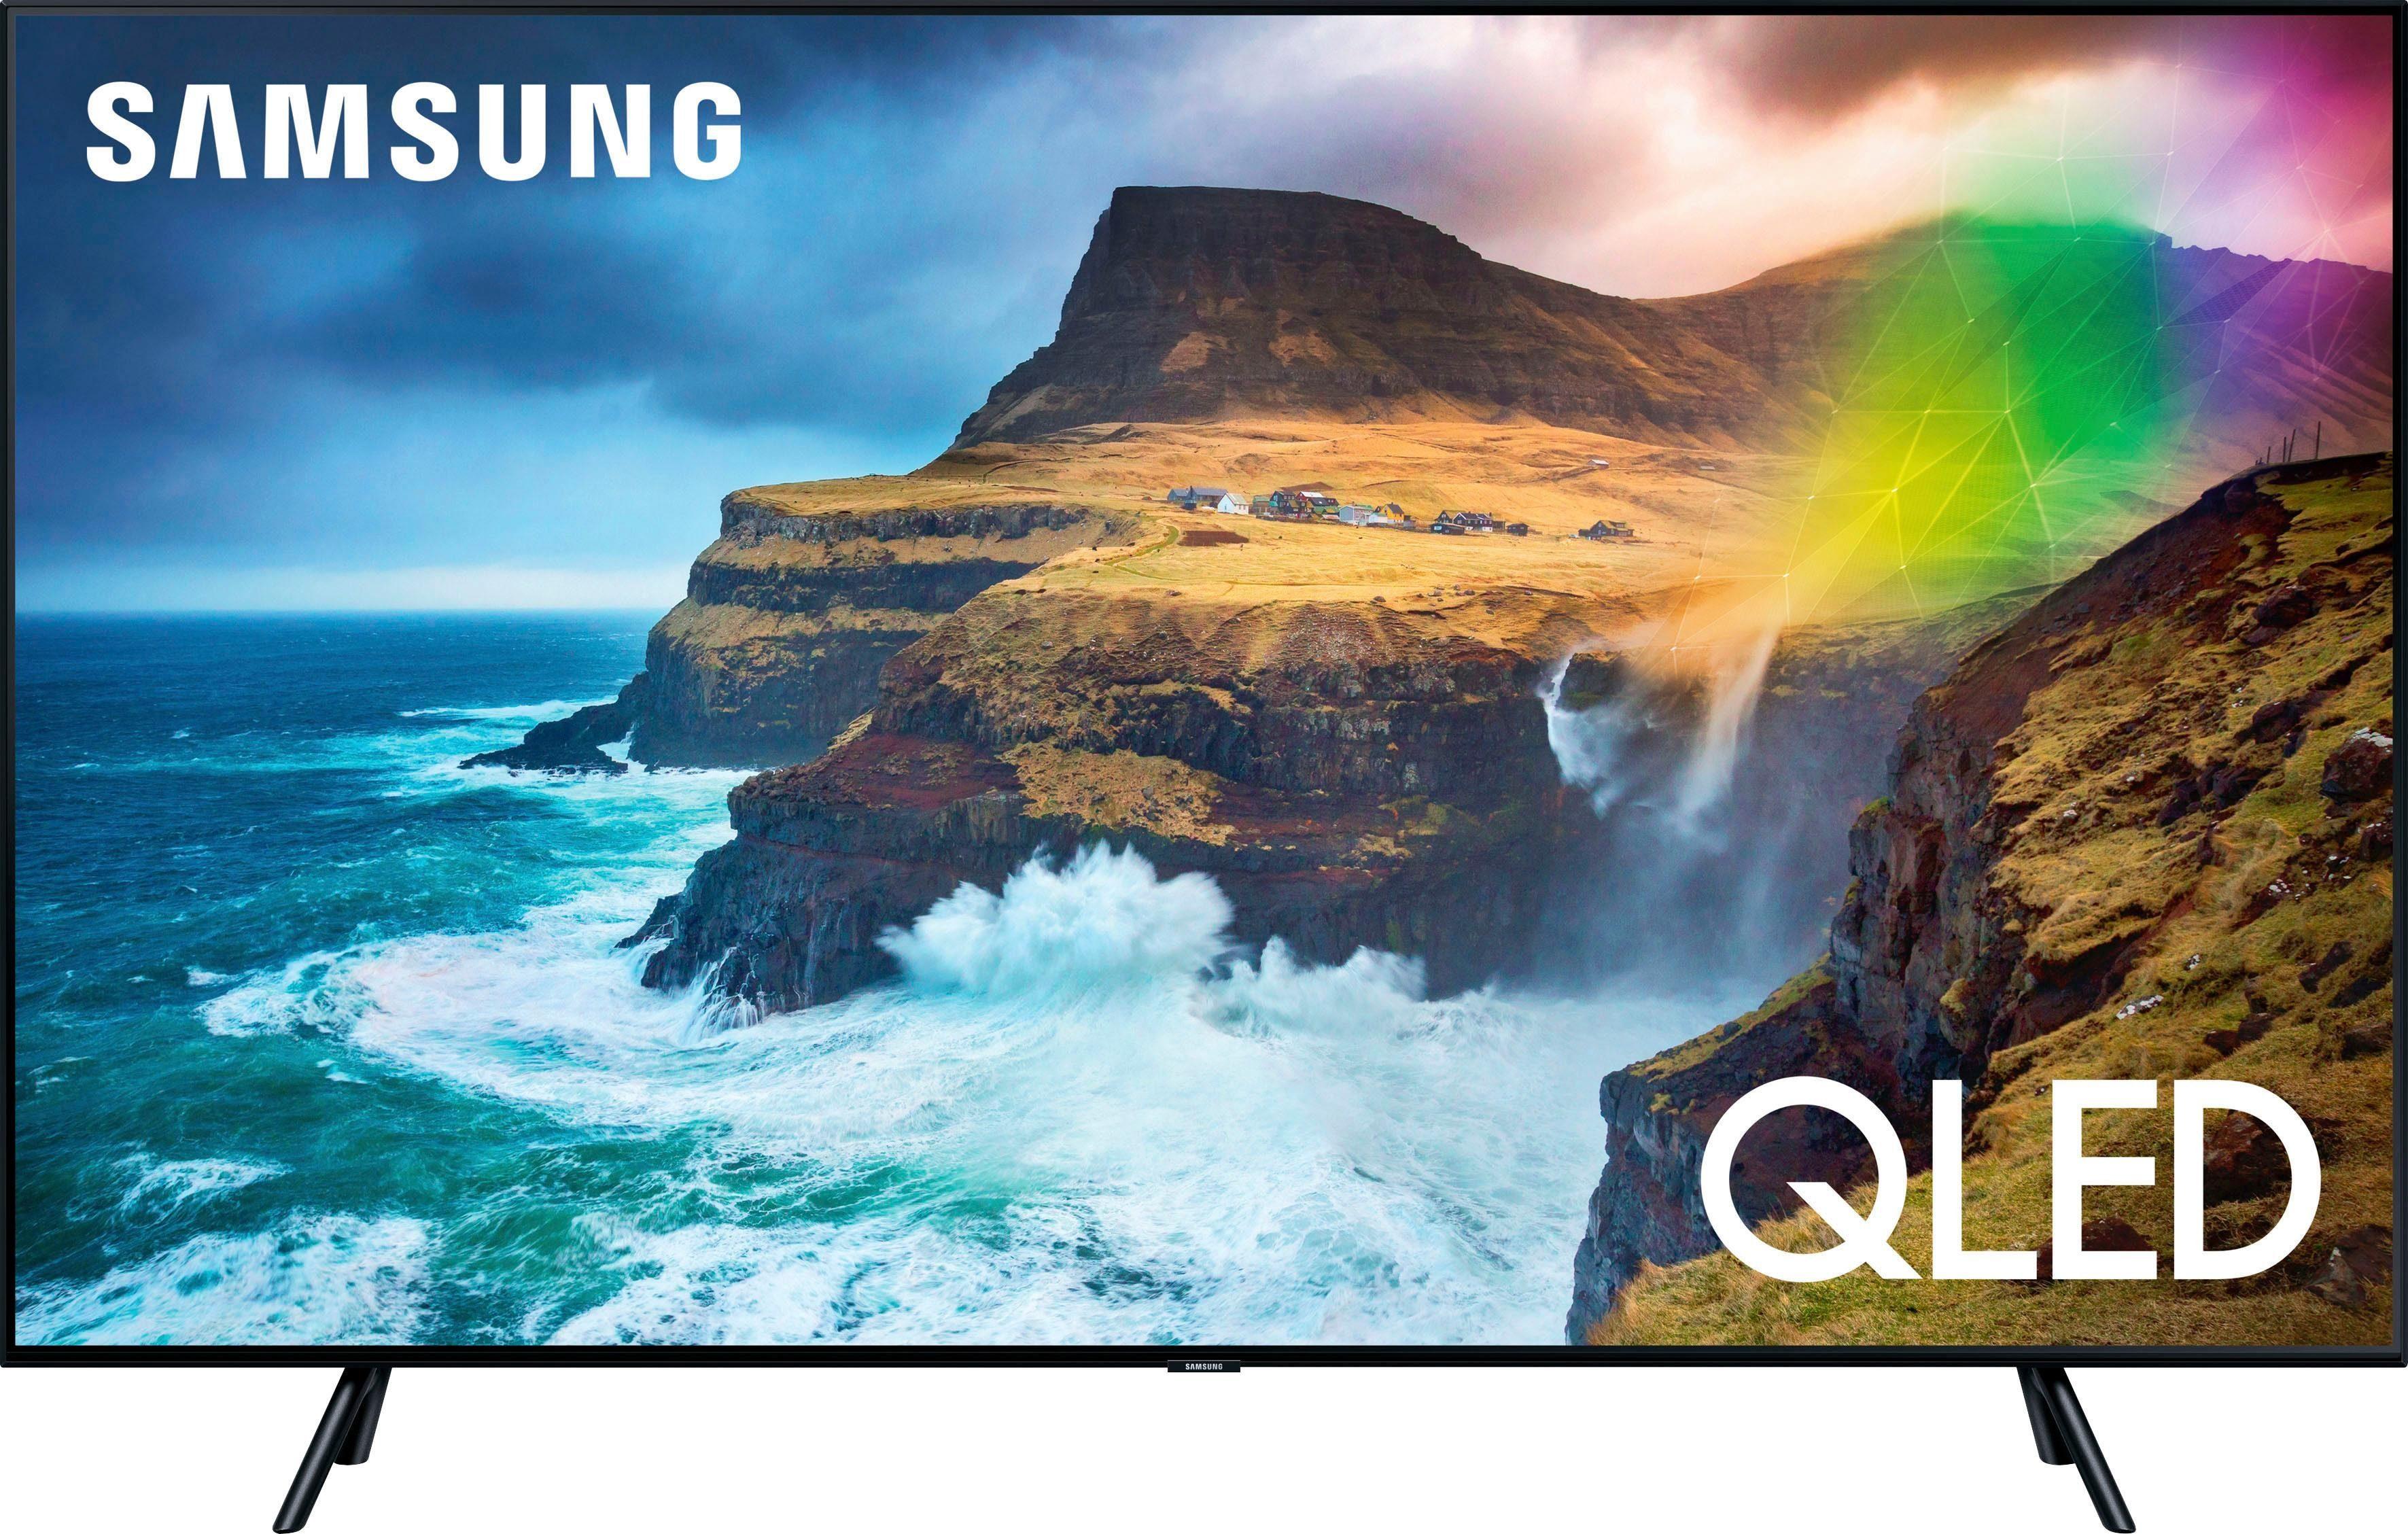 Samsung GQ55Q70R QLED-Fernseher (138 cm/55 Zoll, 4K Ultra HD, Smart-TV)